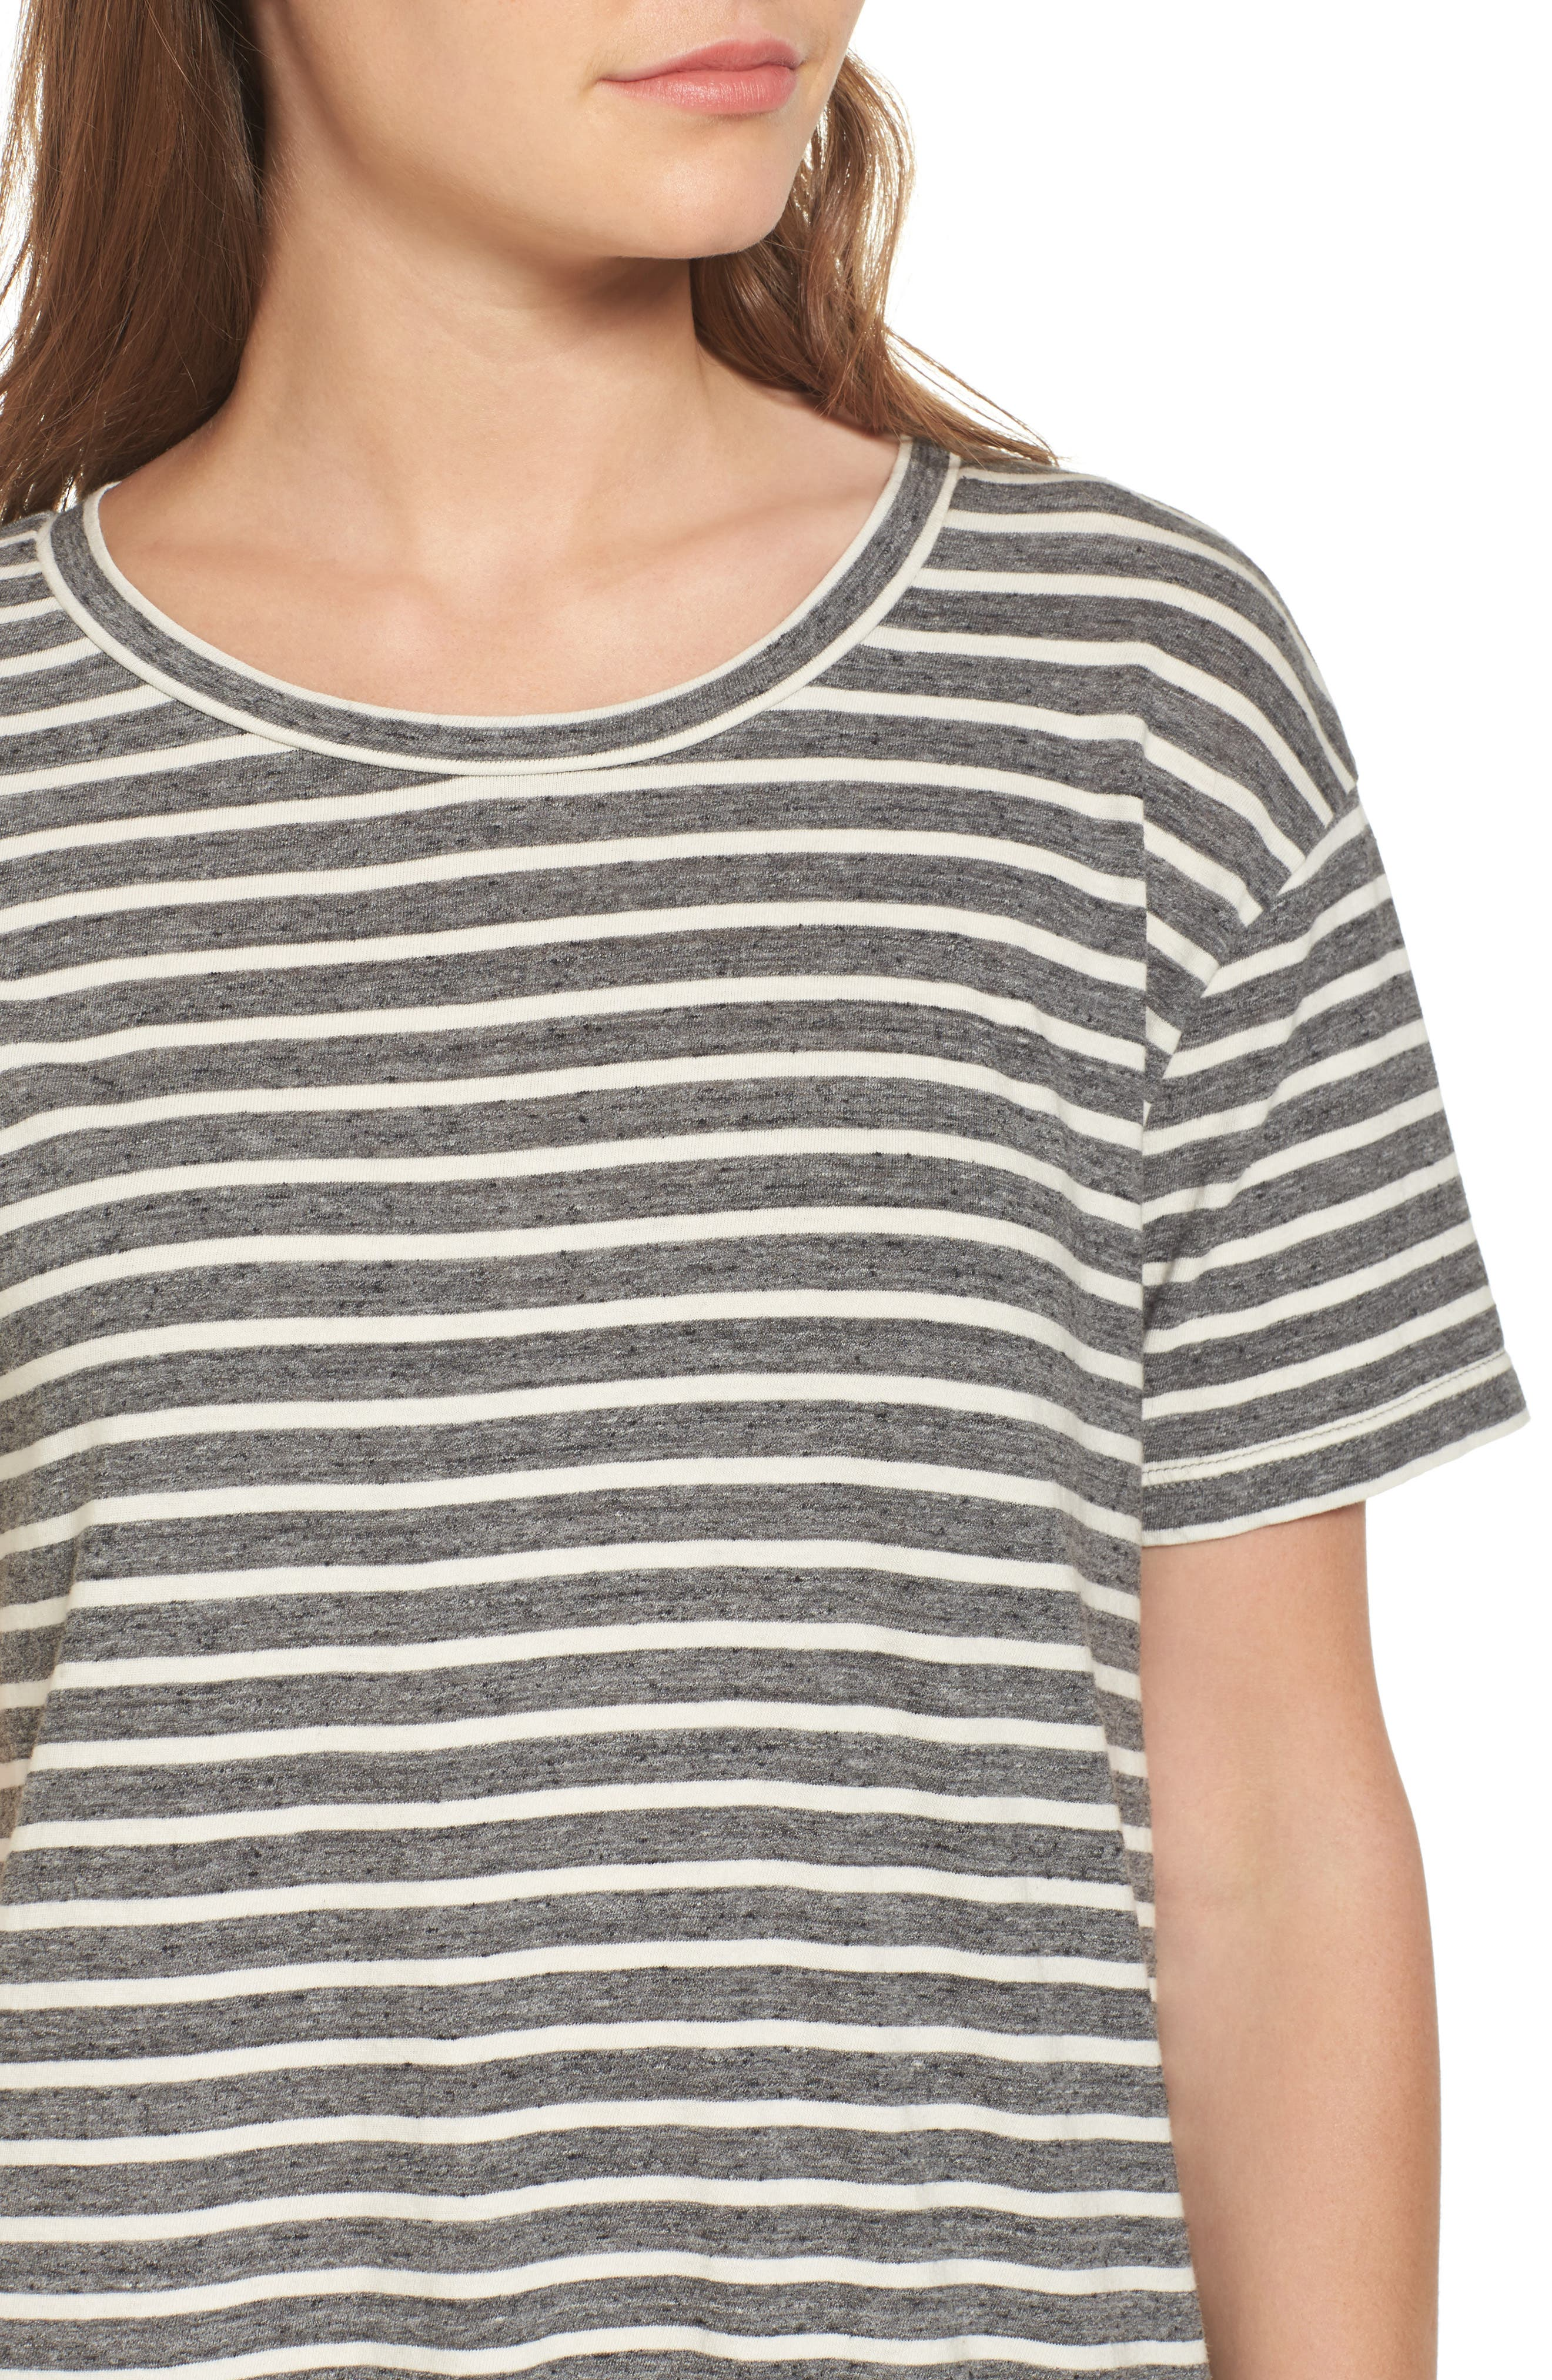 Stripe Knit T-Shirt Dress,                             Alternate thumbnail 4, color,                             Charcoal Anchor Stripe